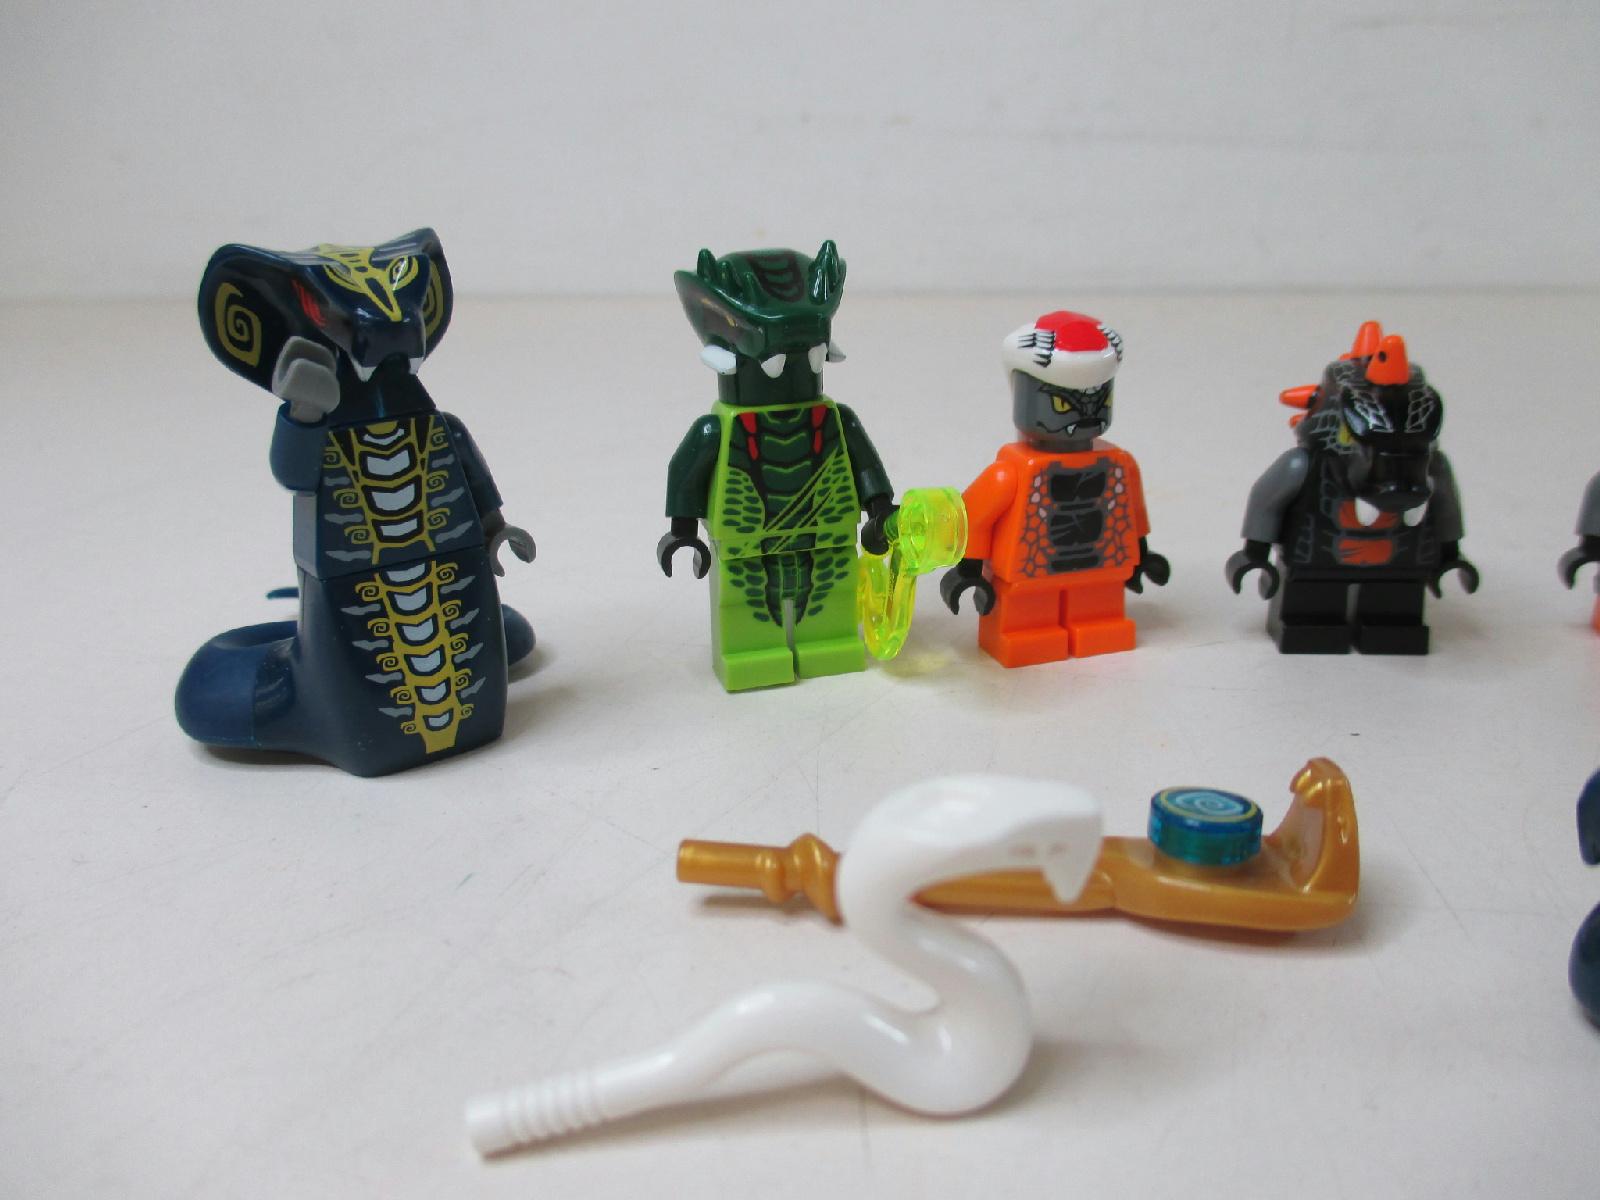 Lot of 8 lego ninjago snake people minifigures ebay - Serpent lego ninjago ...